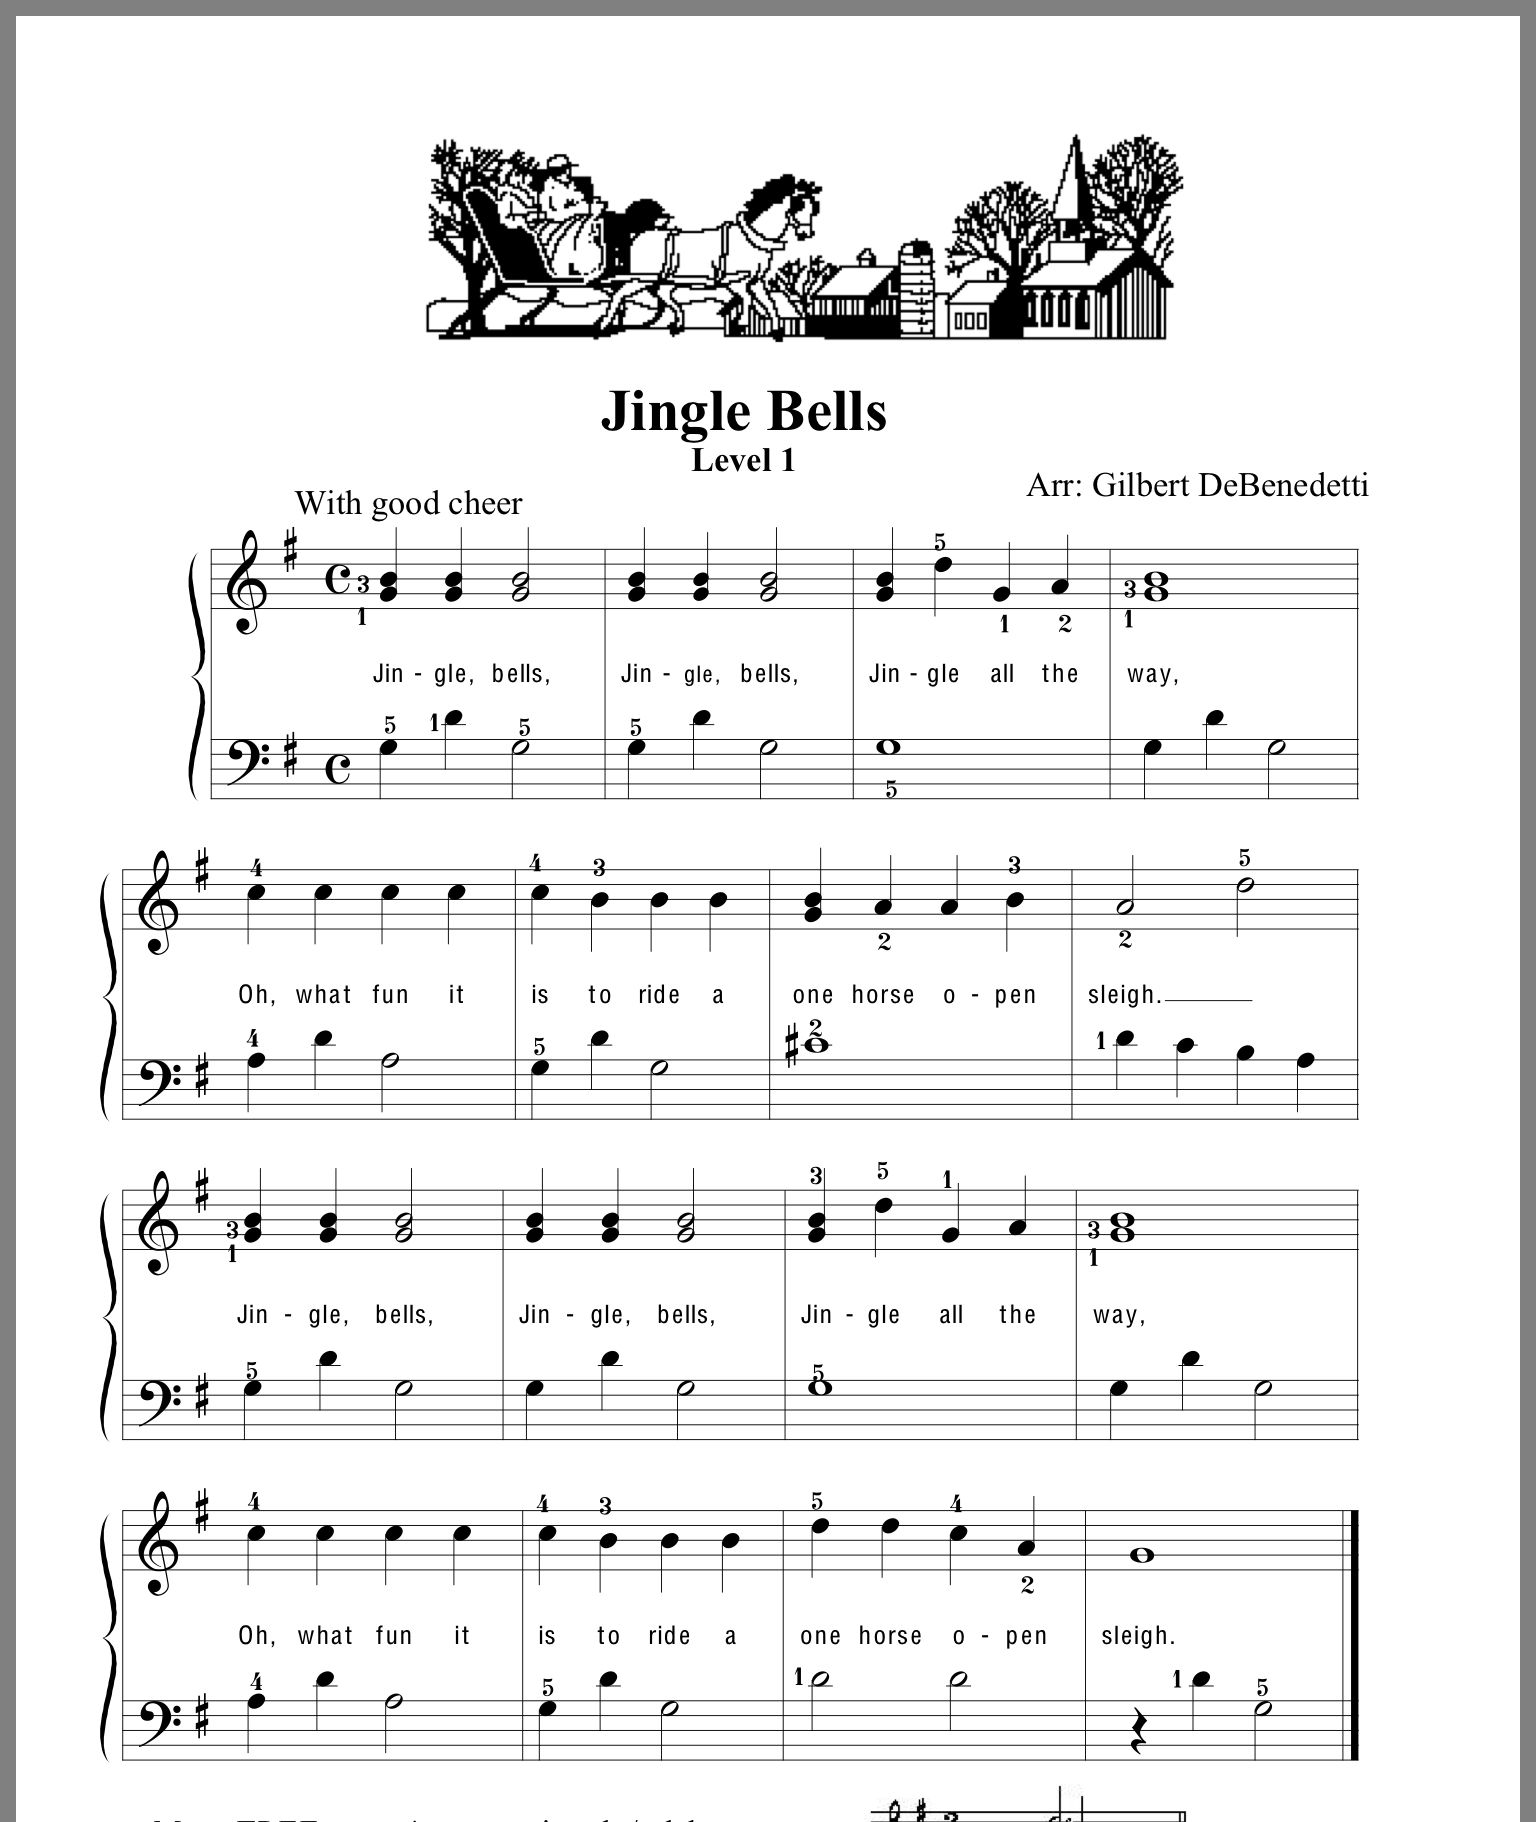 Jingle Bells Piano Lessons Lesson Sheet Music [ 1822 x 1536 Pixel ]